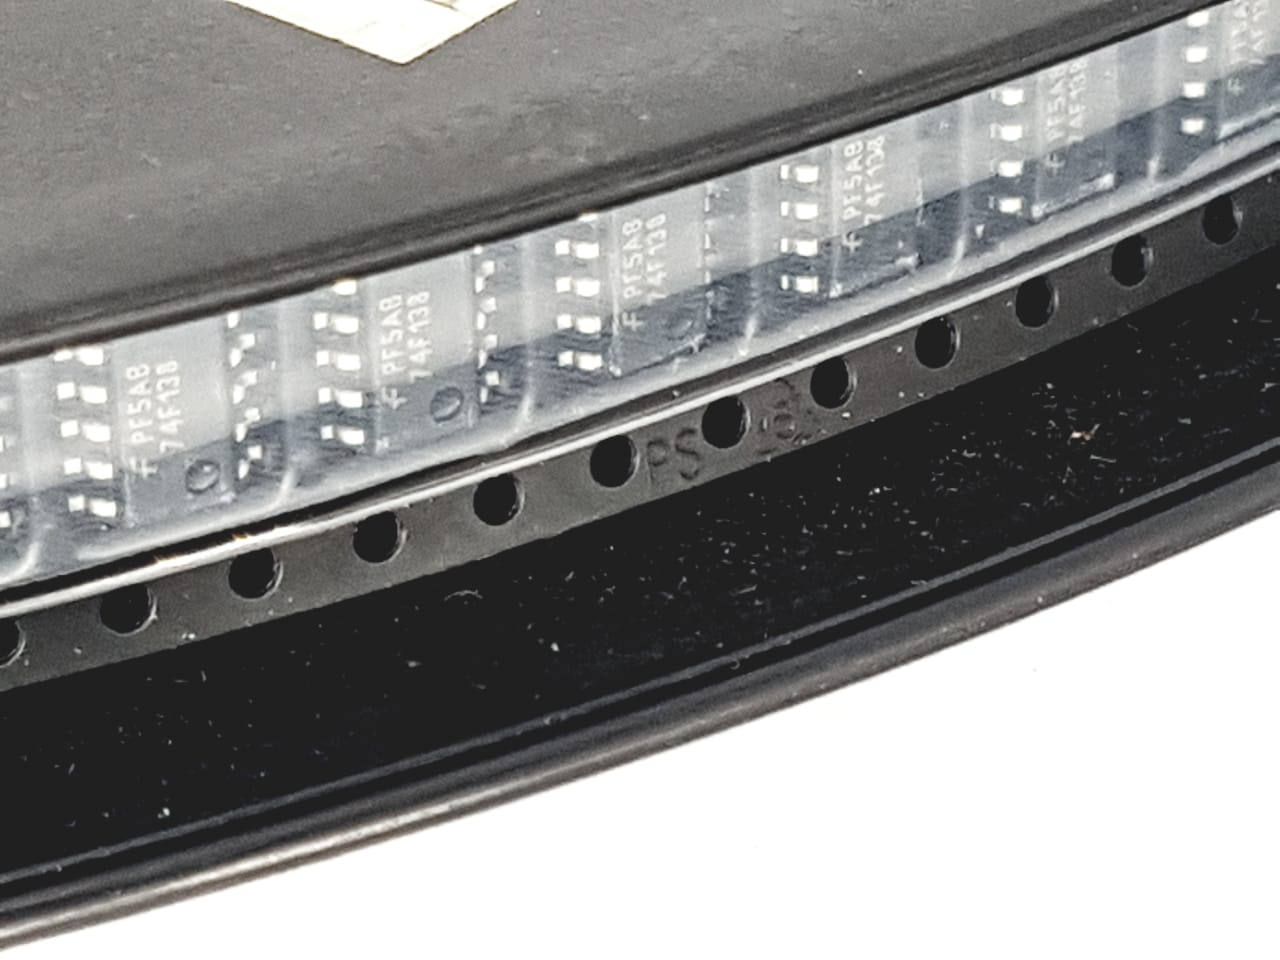 10 peças Circuito Integrado SMD 7xF138 Soic-16 74F138Scx